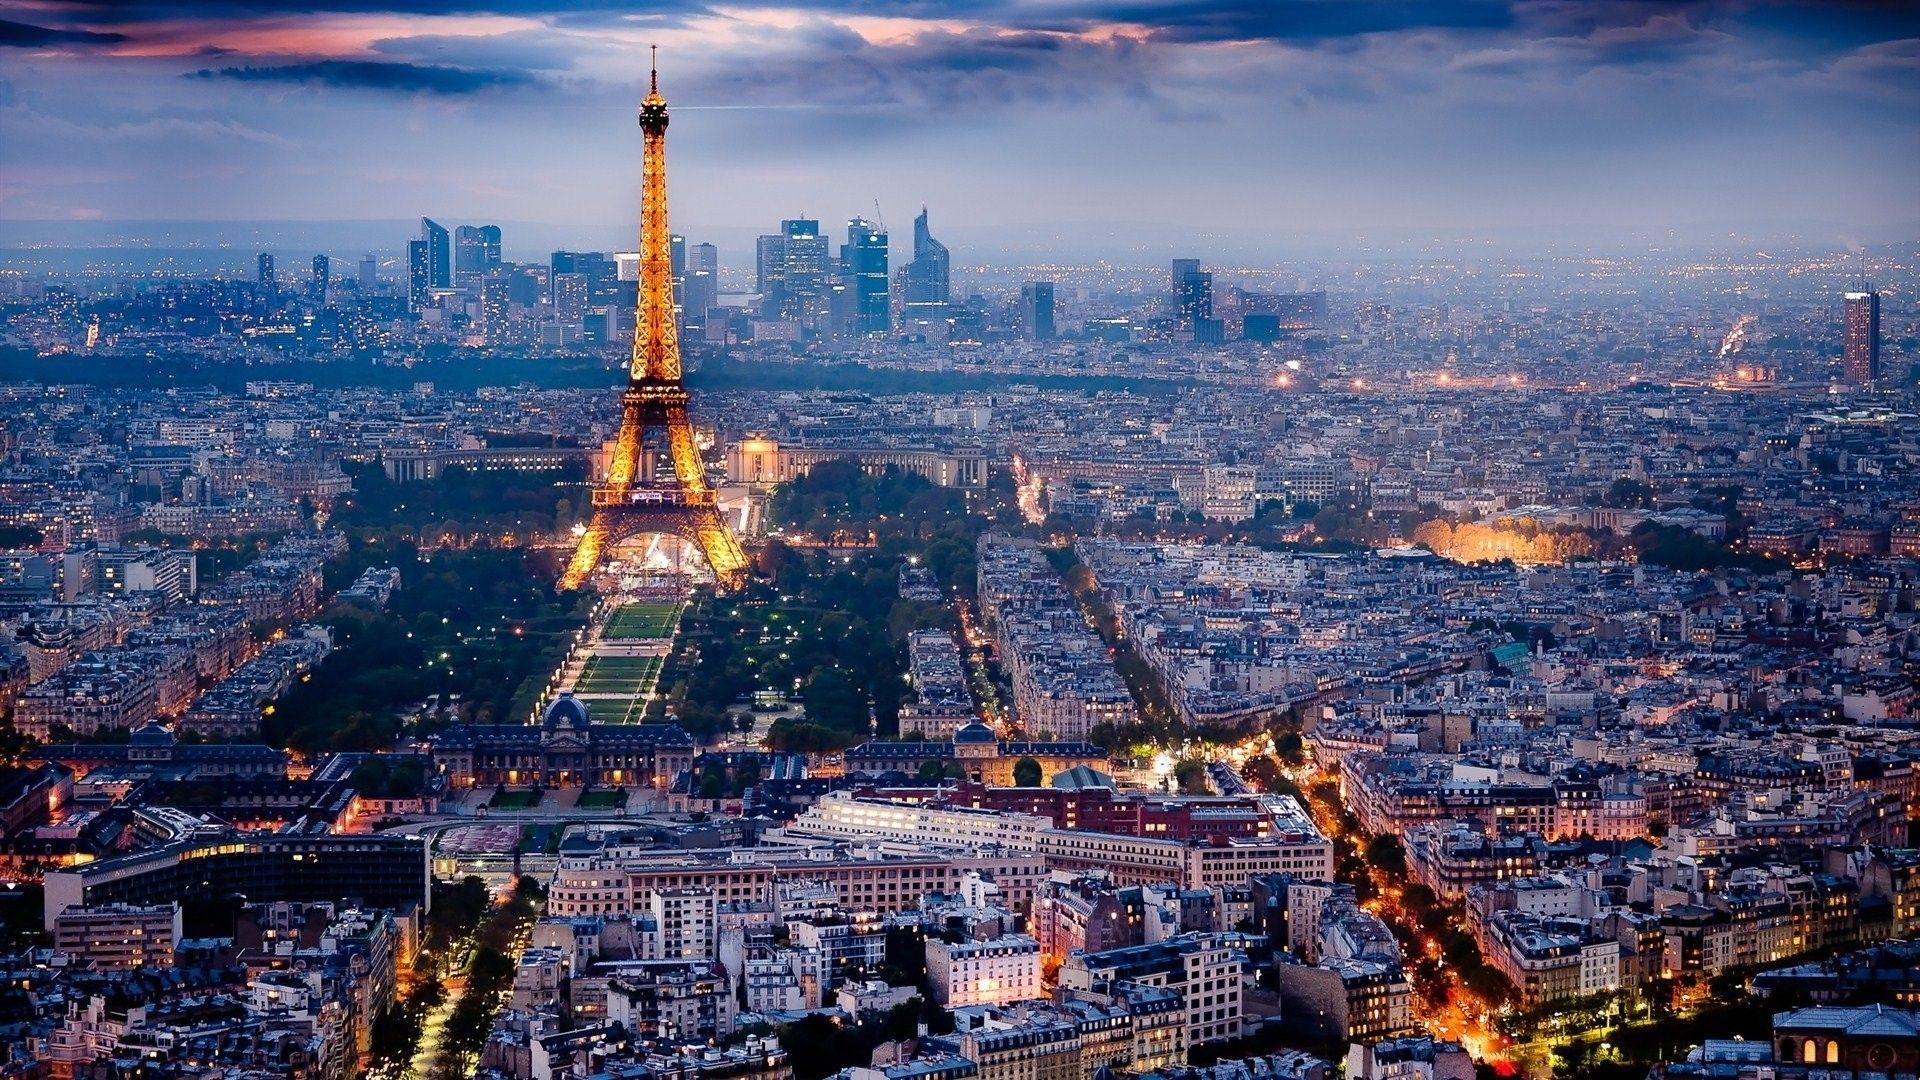 Res 1920x1080 New Windows 10 Desktop Background 4k In 2020 Paris Wallpaper City Wallpaper Cool Desktop Backgrounds